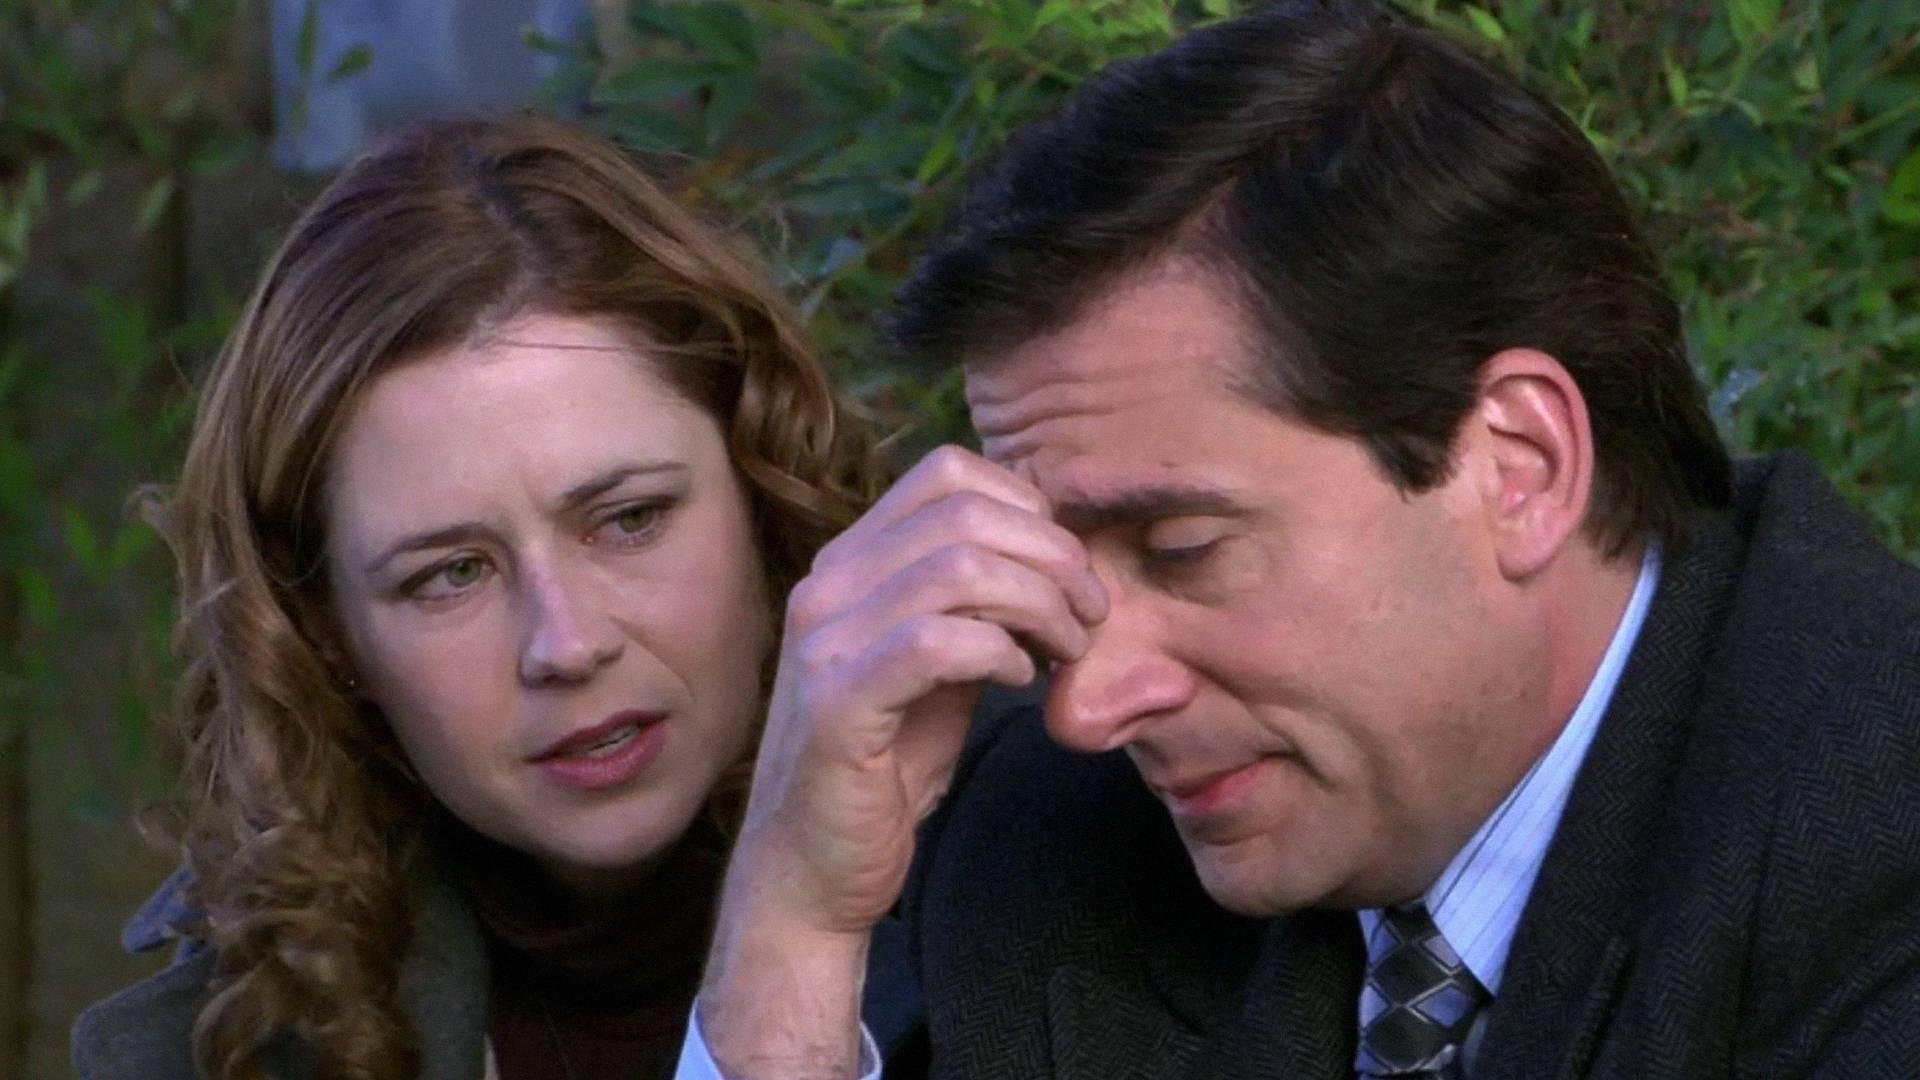 The Office Season 5 Episode 17